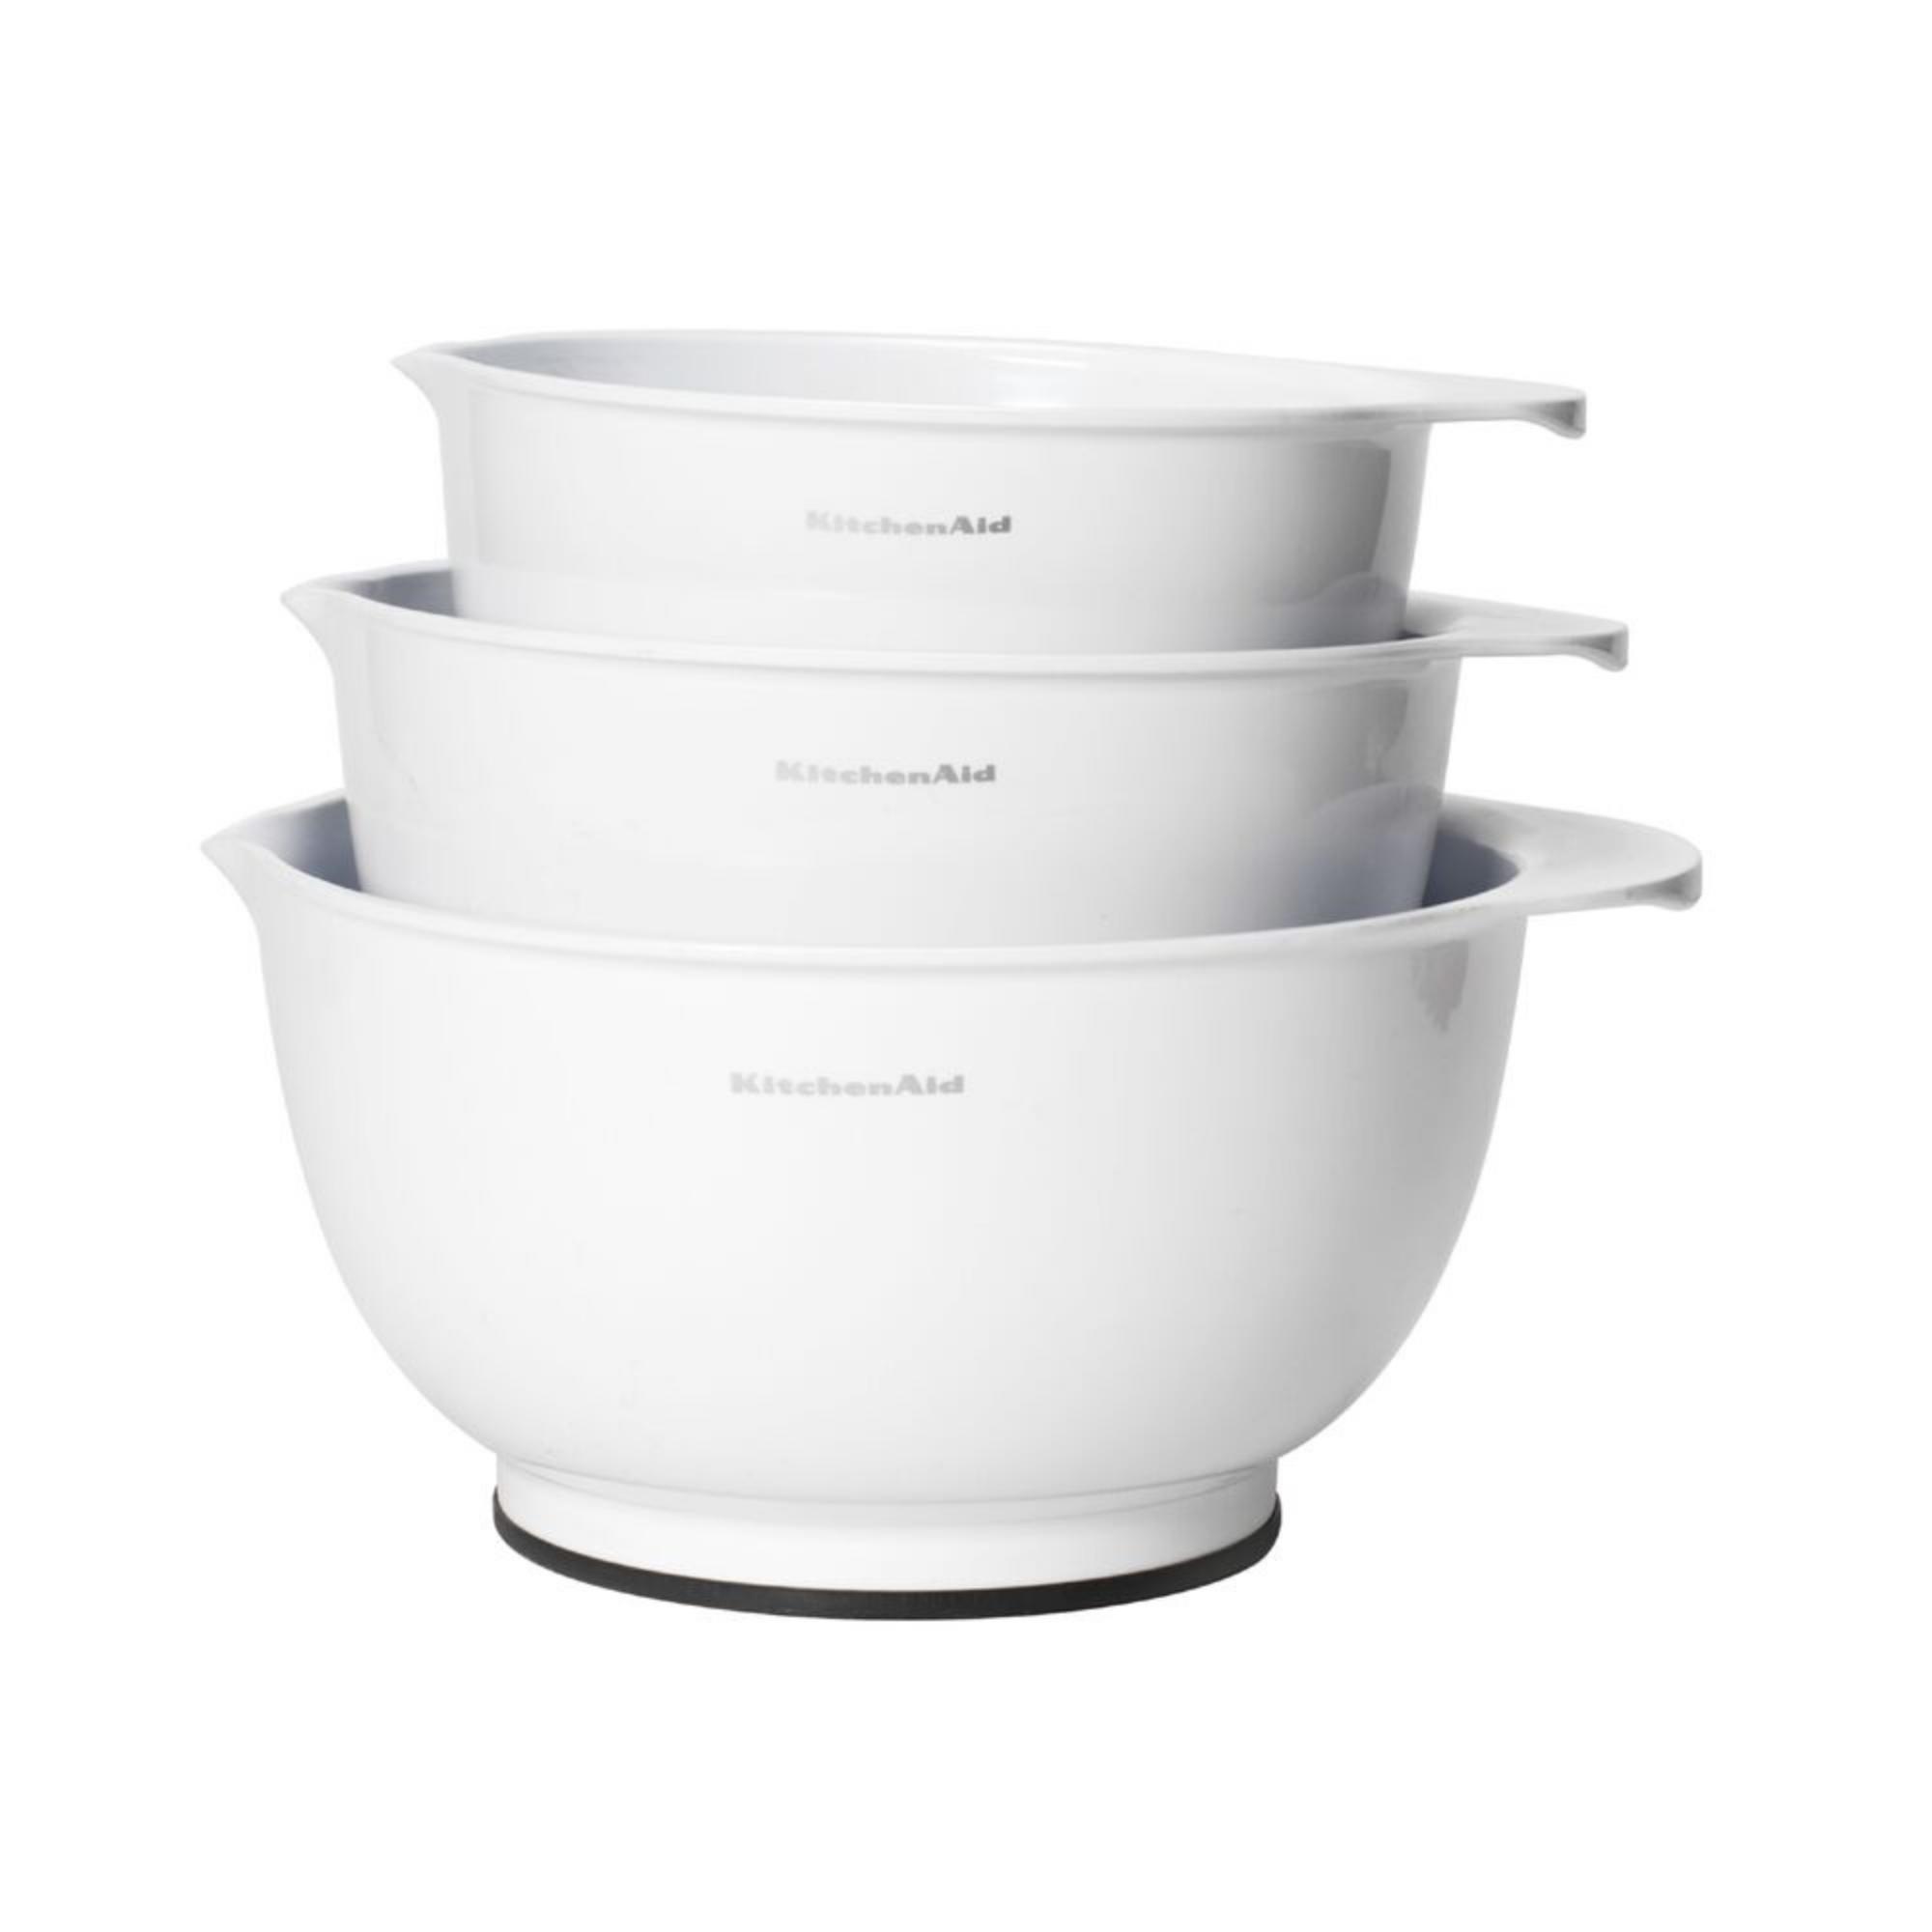 Kit Tigelas Bowls 3 Peças Antiderrapante Branca KitchenAid